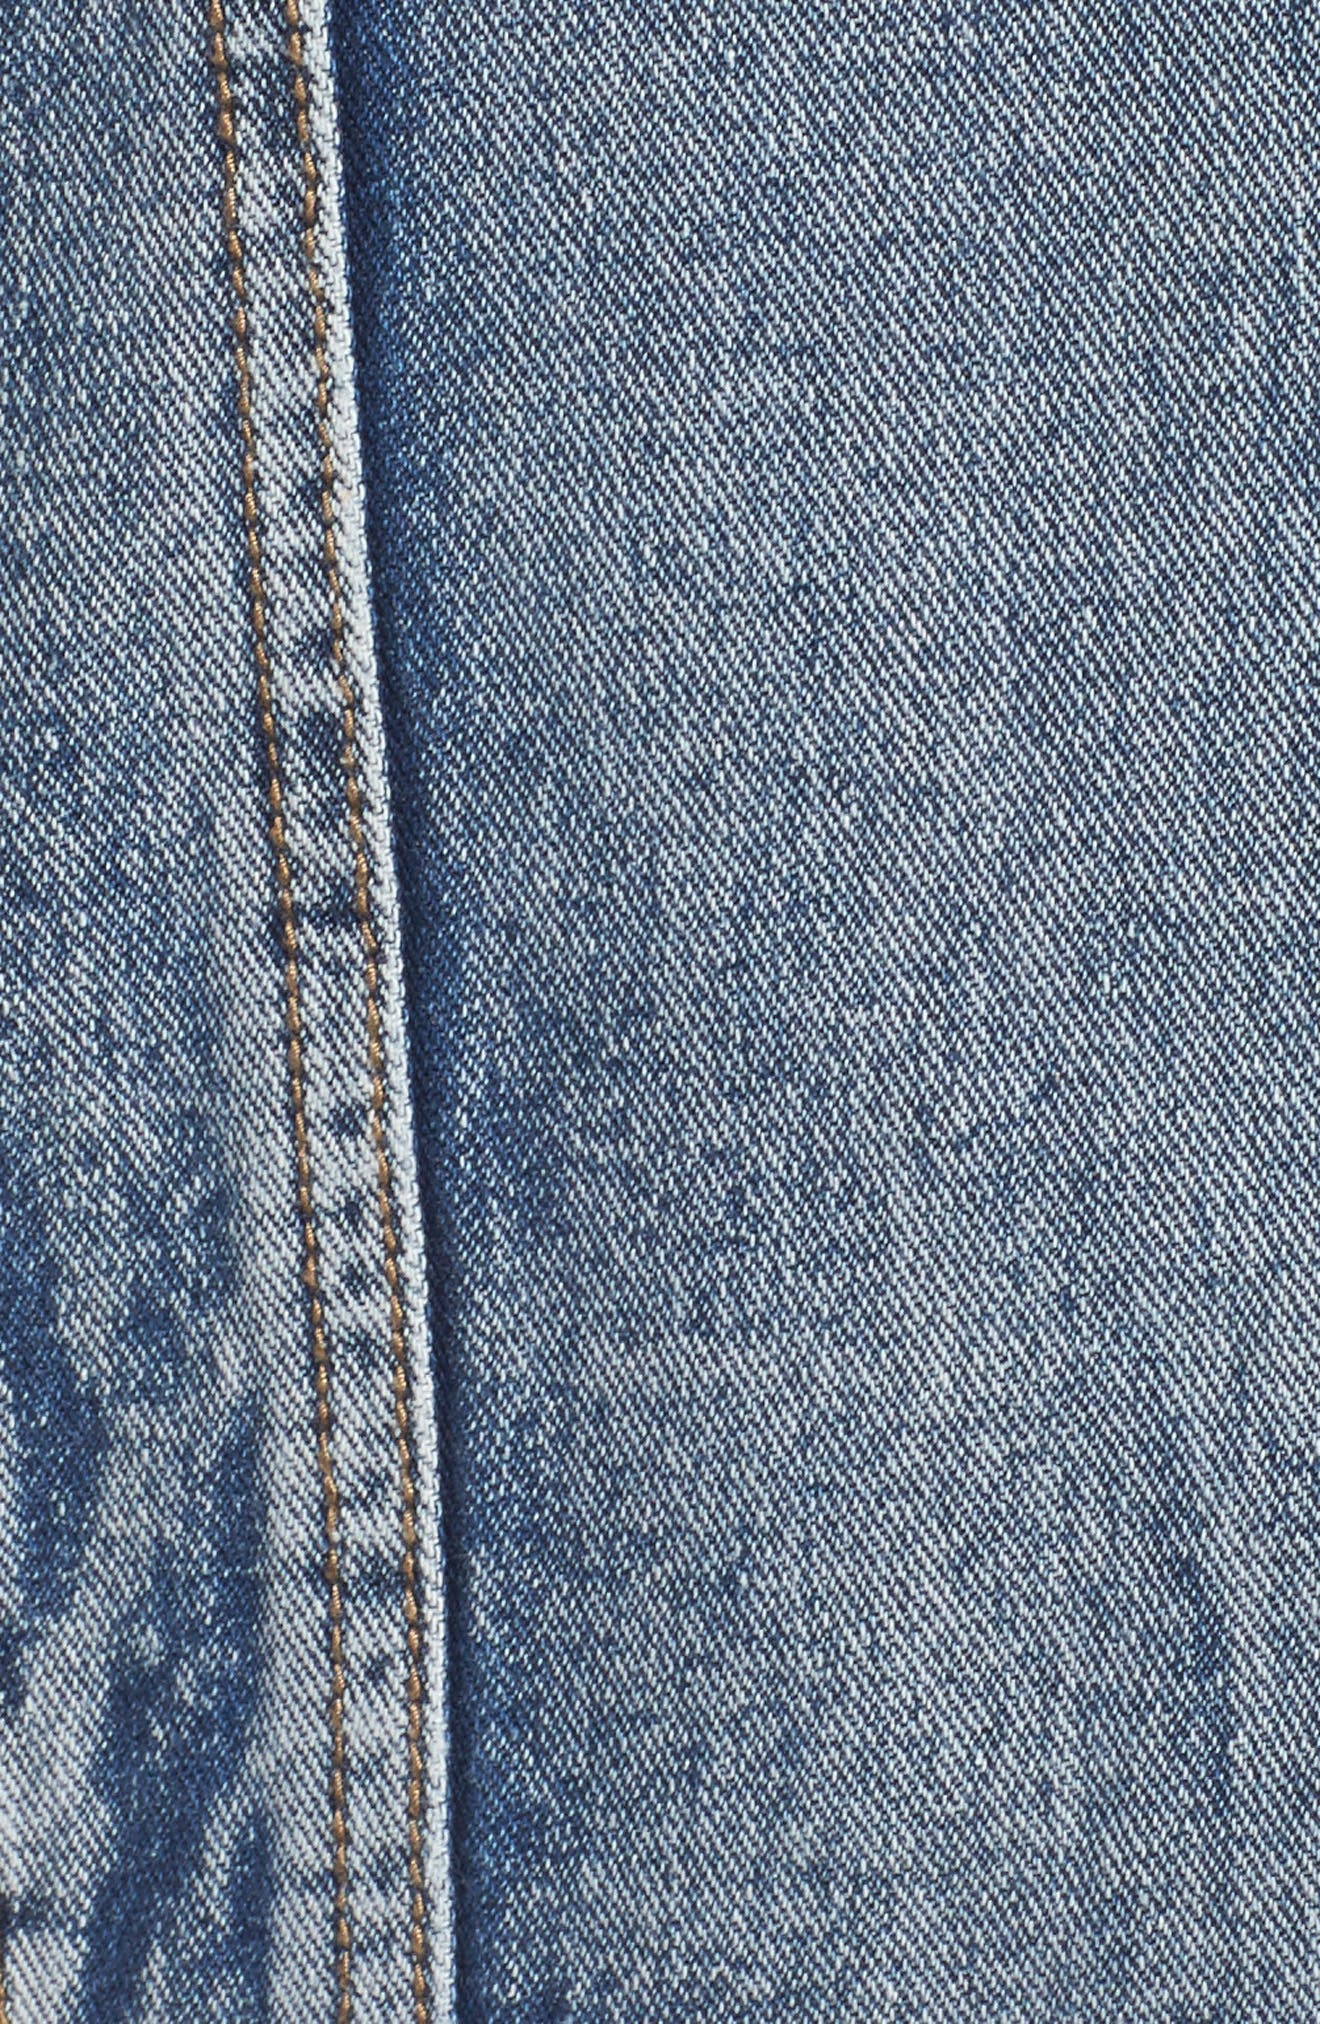 Embellished Distressed Denim Jacket,                             Alternate thumbnail 6, color,                             Mid Stonewash